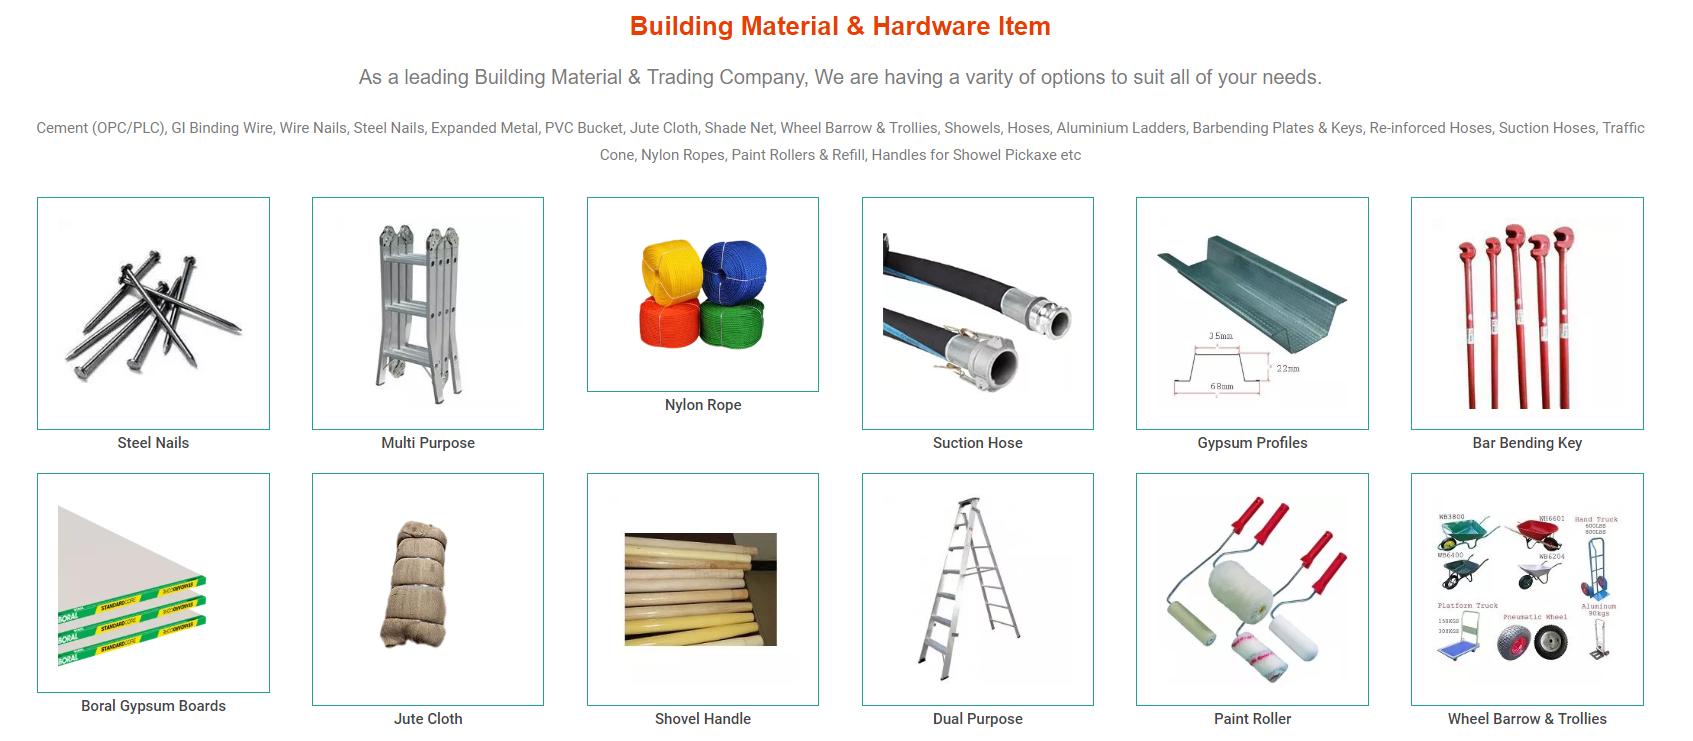 Find Electrical Contractor - in UAE - Dubai, Professional